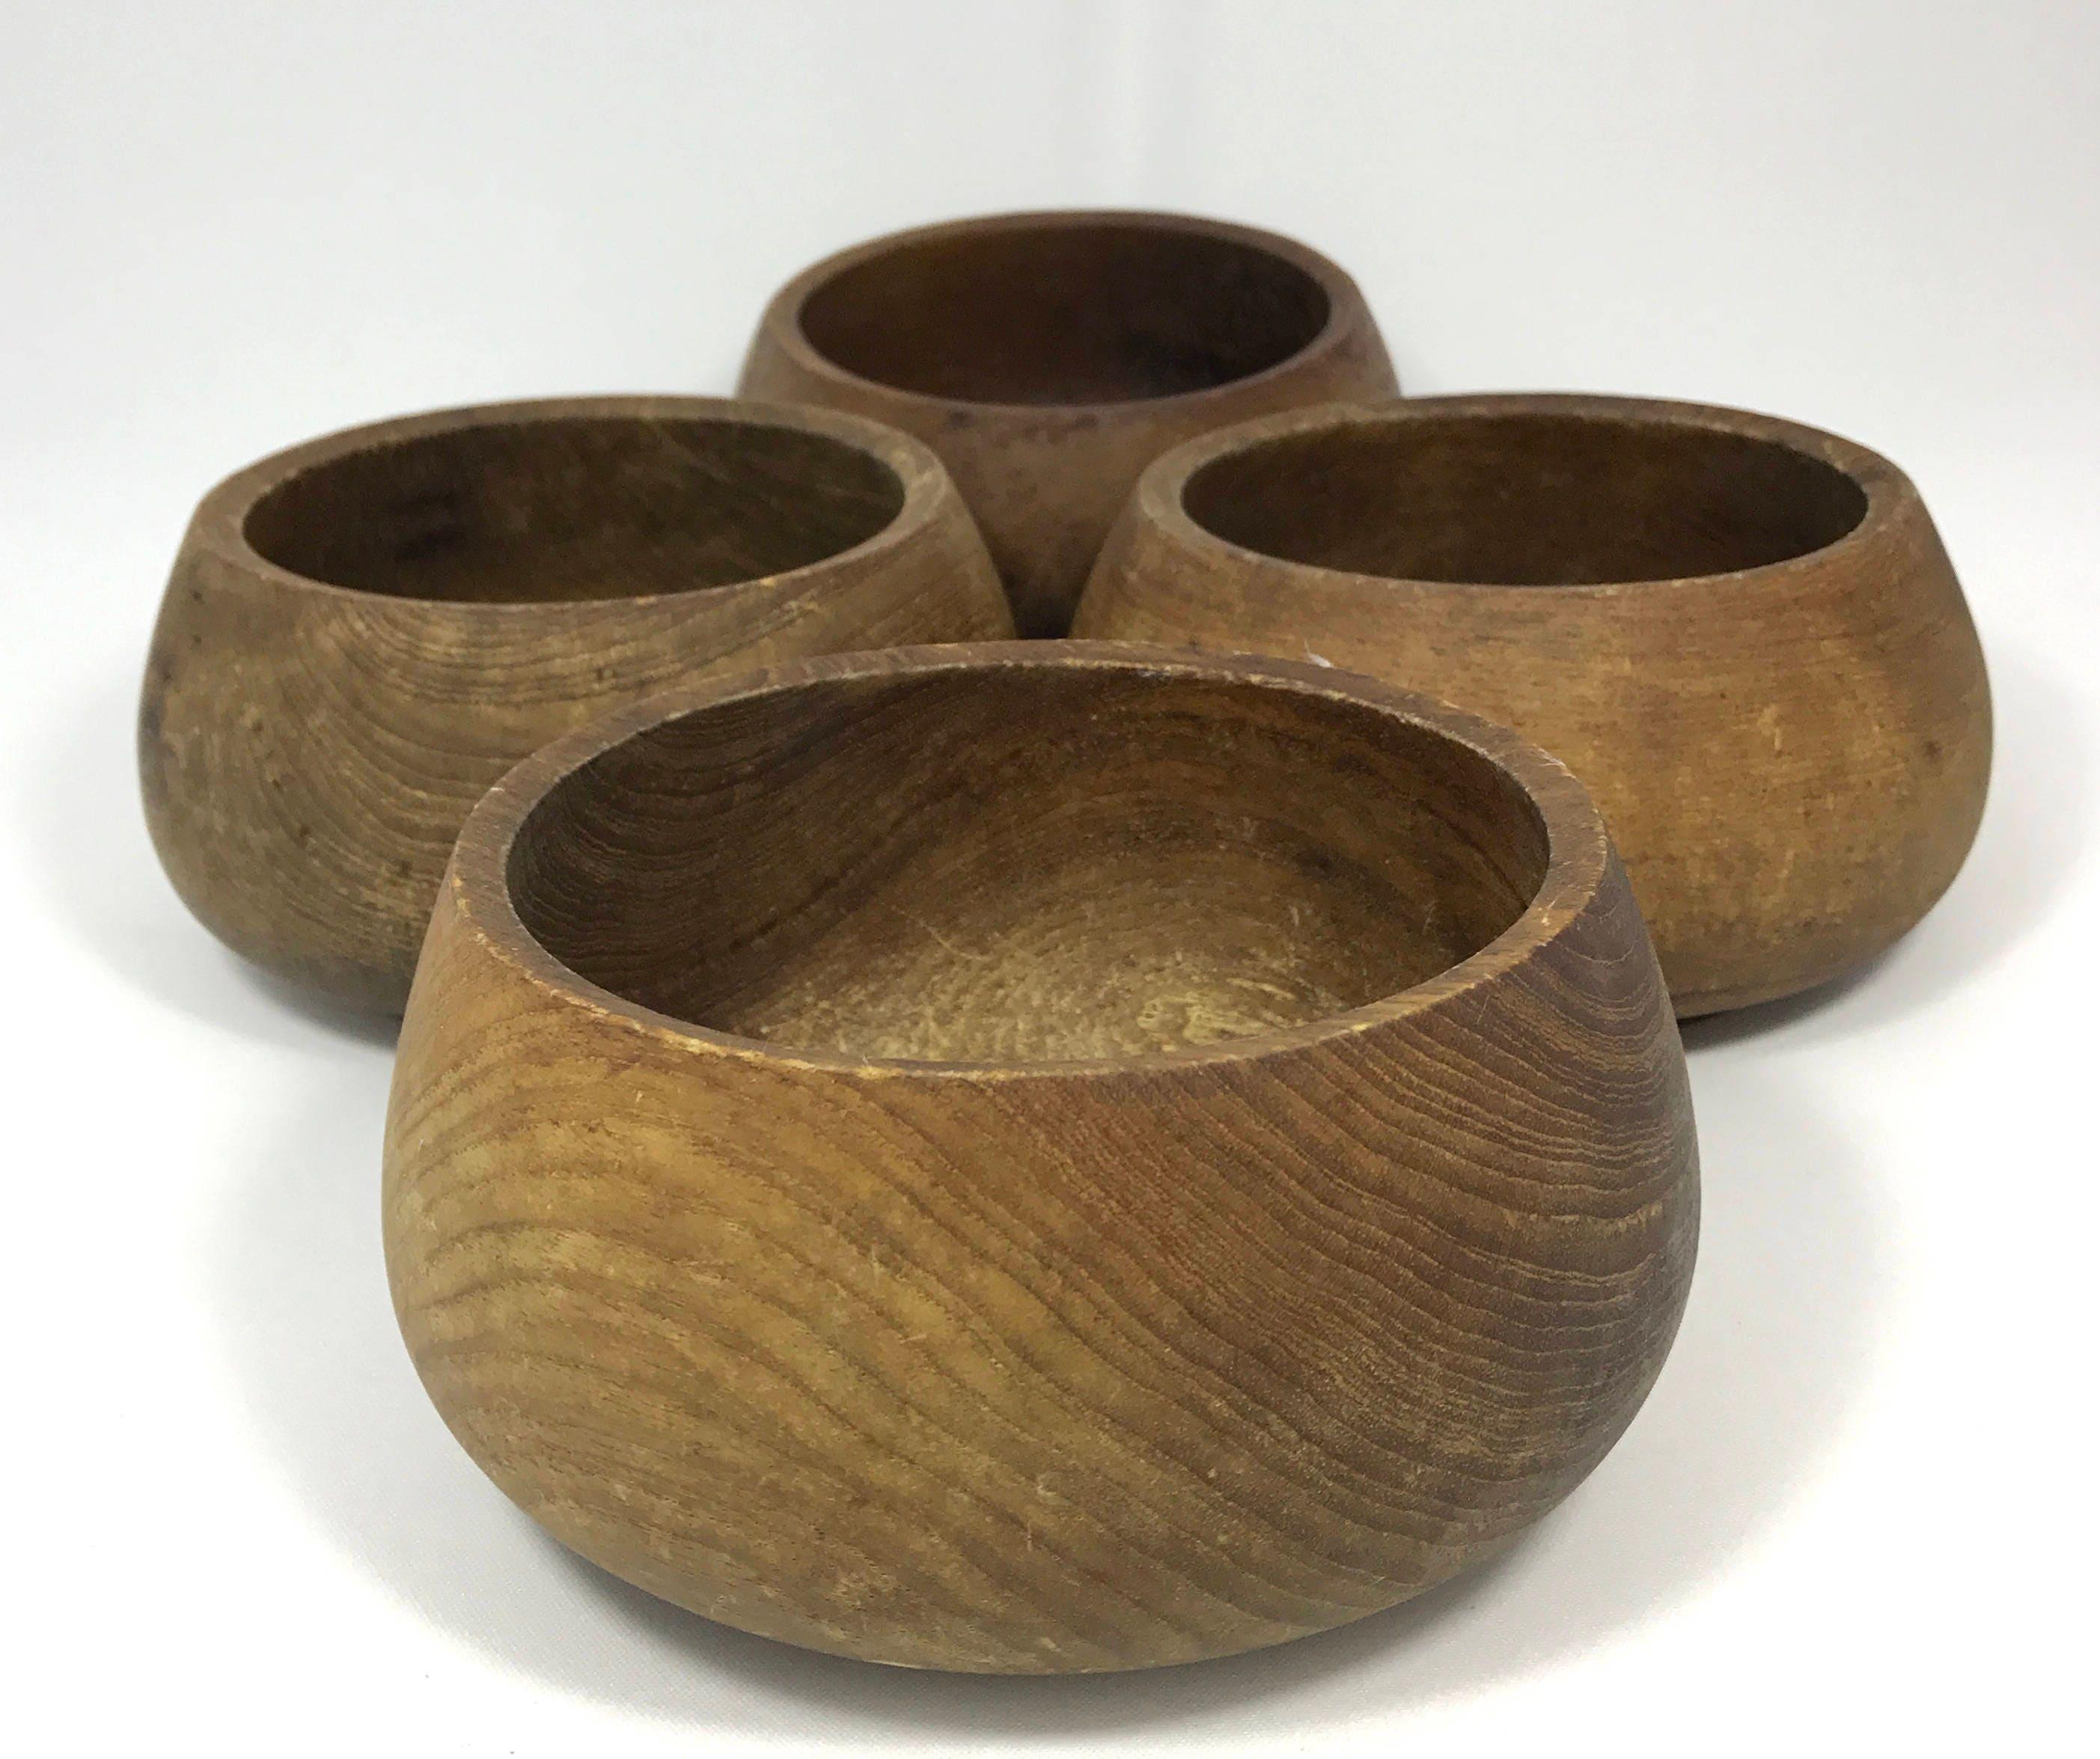 Wooden Dining Bowls ~ Rustic teak wood bowls set of vintage weathered